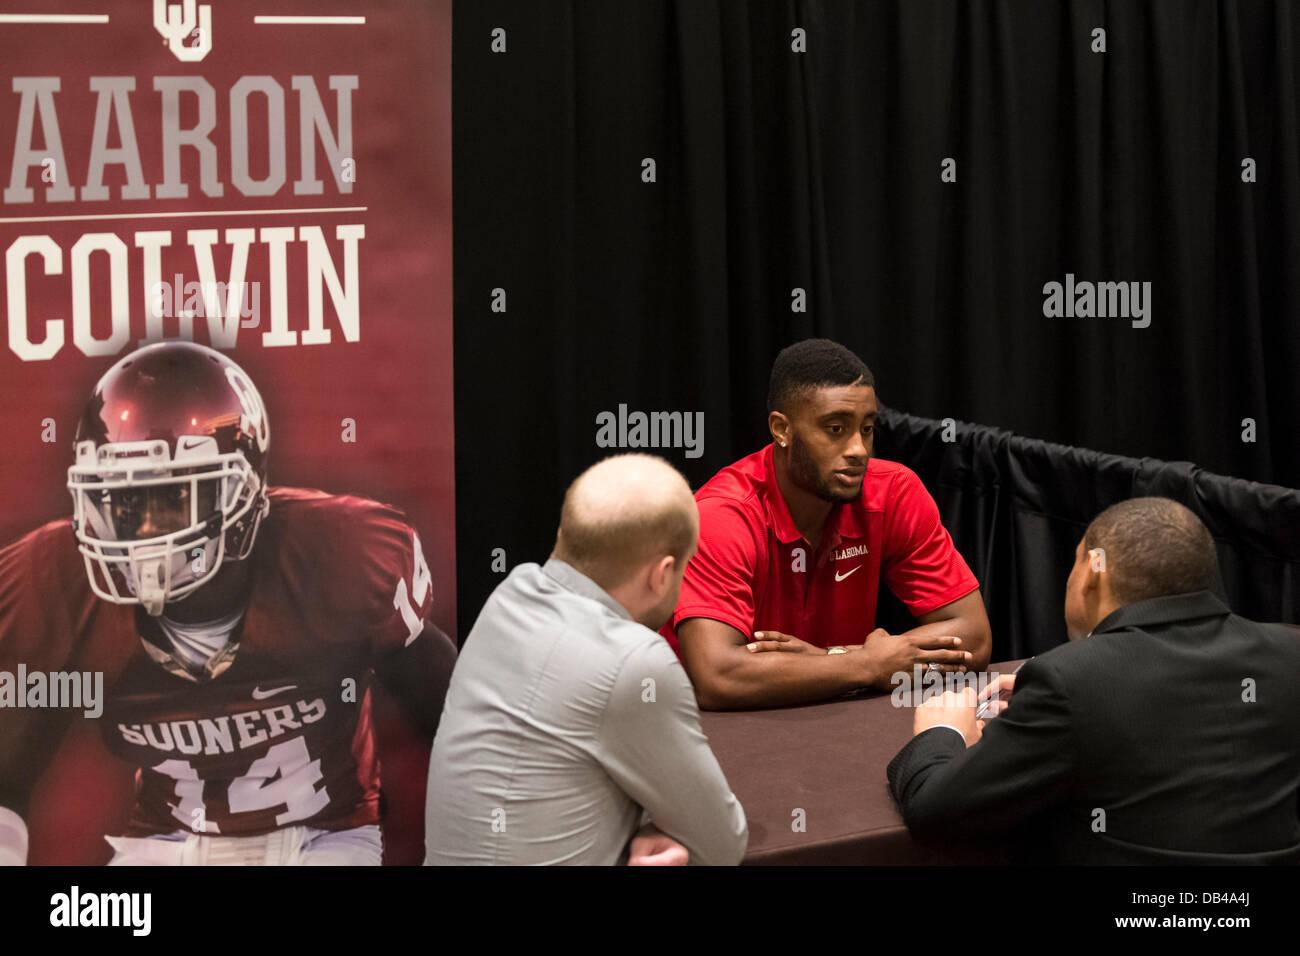 Dallas, Texas, USA. 23rd July, 2013. July 23, 2103: Oklahoma Sooners cornerback Aaron Colvin talks with reporters - Stock Image